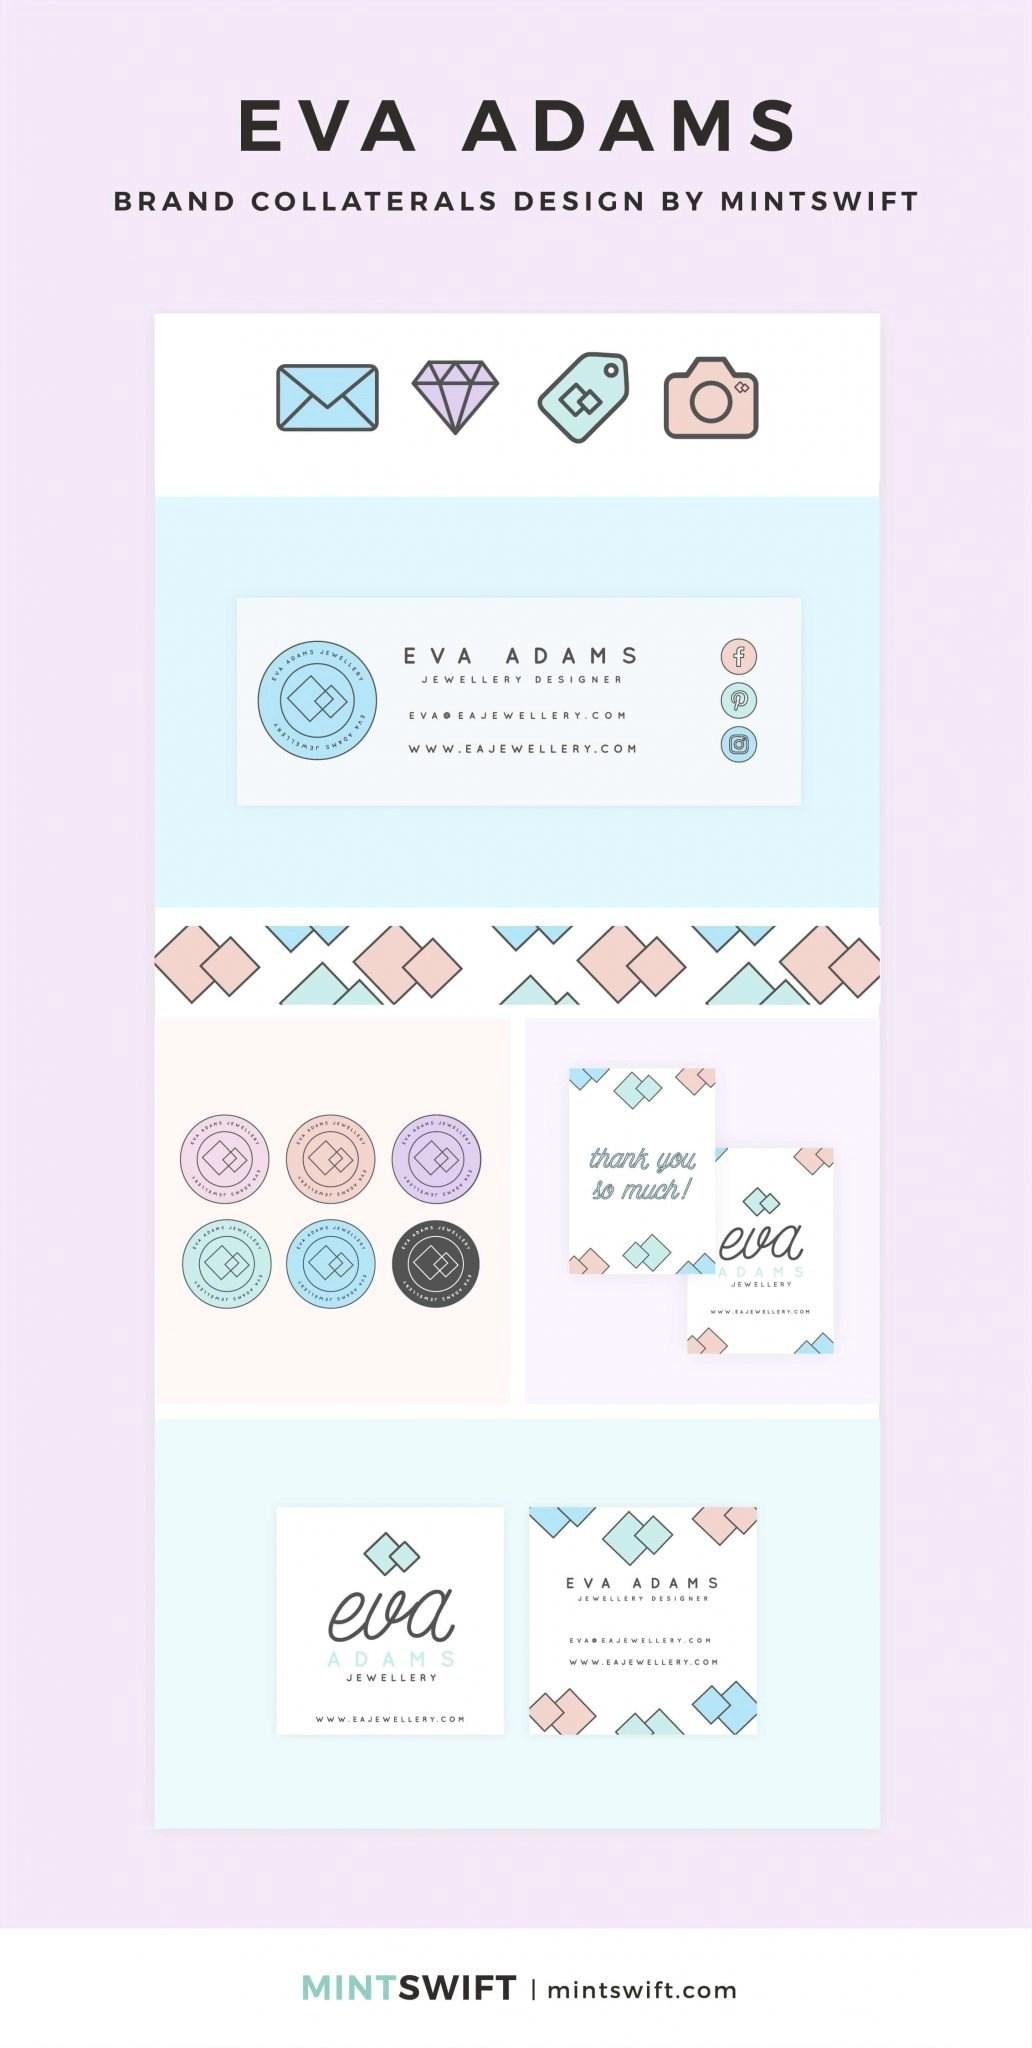 Eva Adams - Brand Collaterals Design - MintSwift - Adrianna Leszczynska